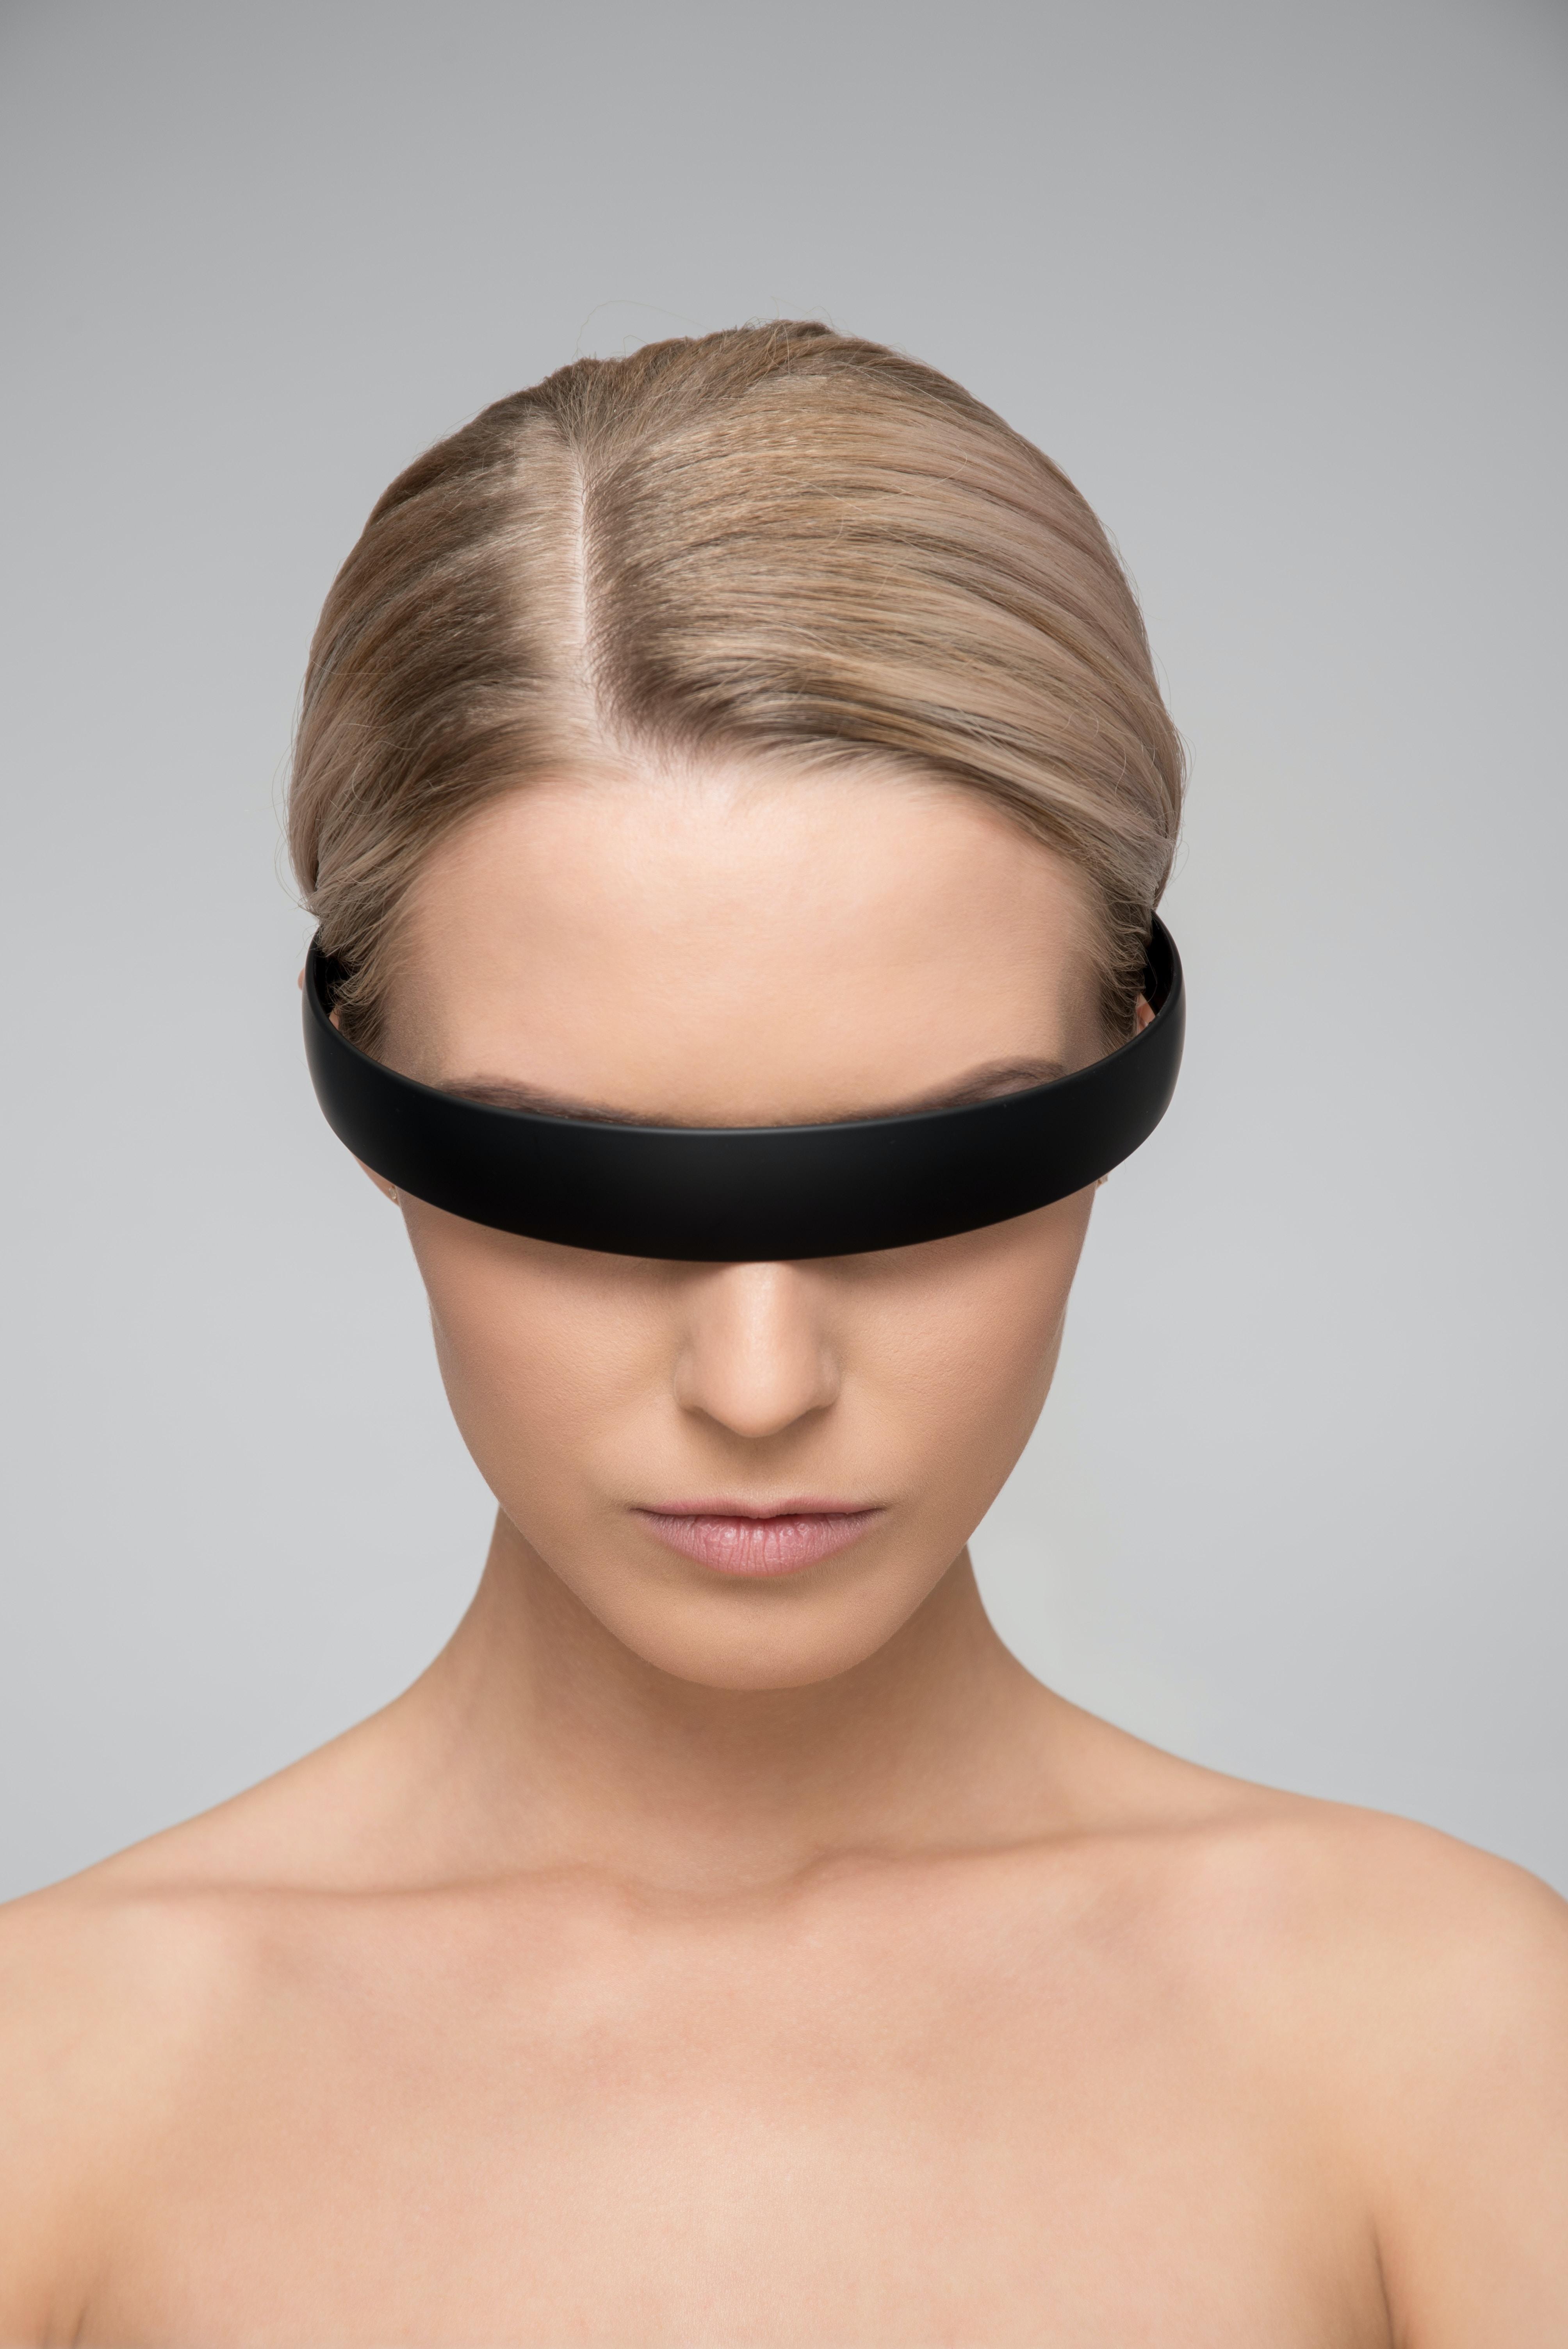 woman wearing black Alice band